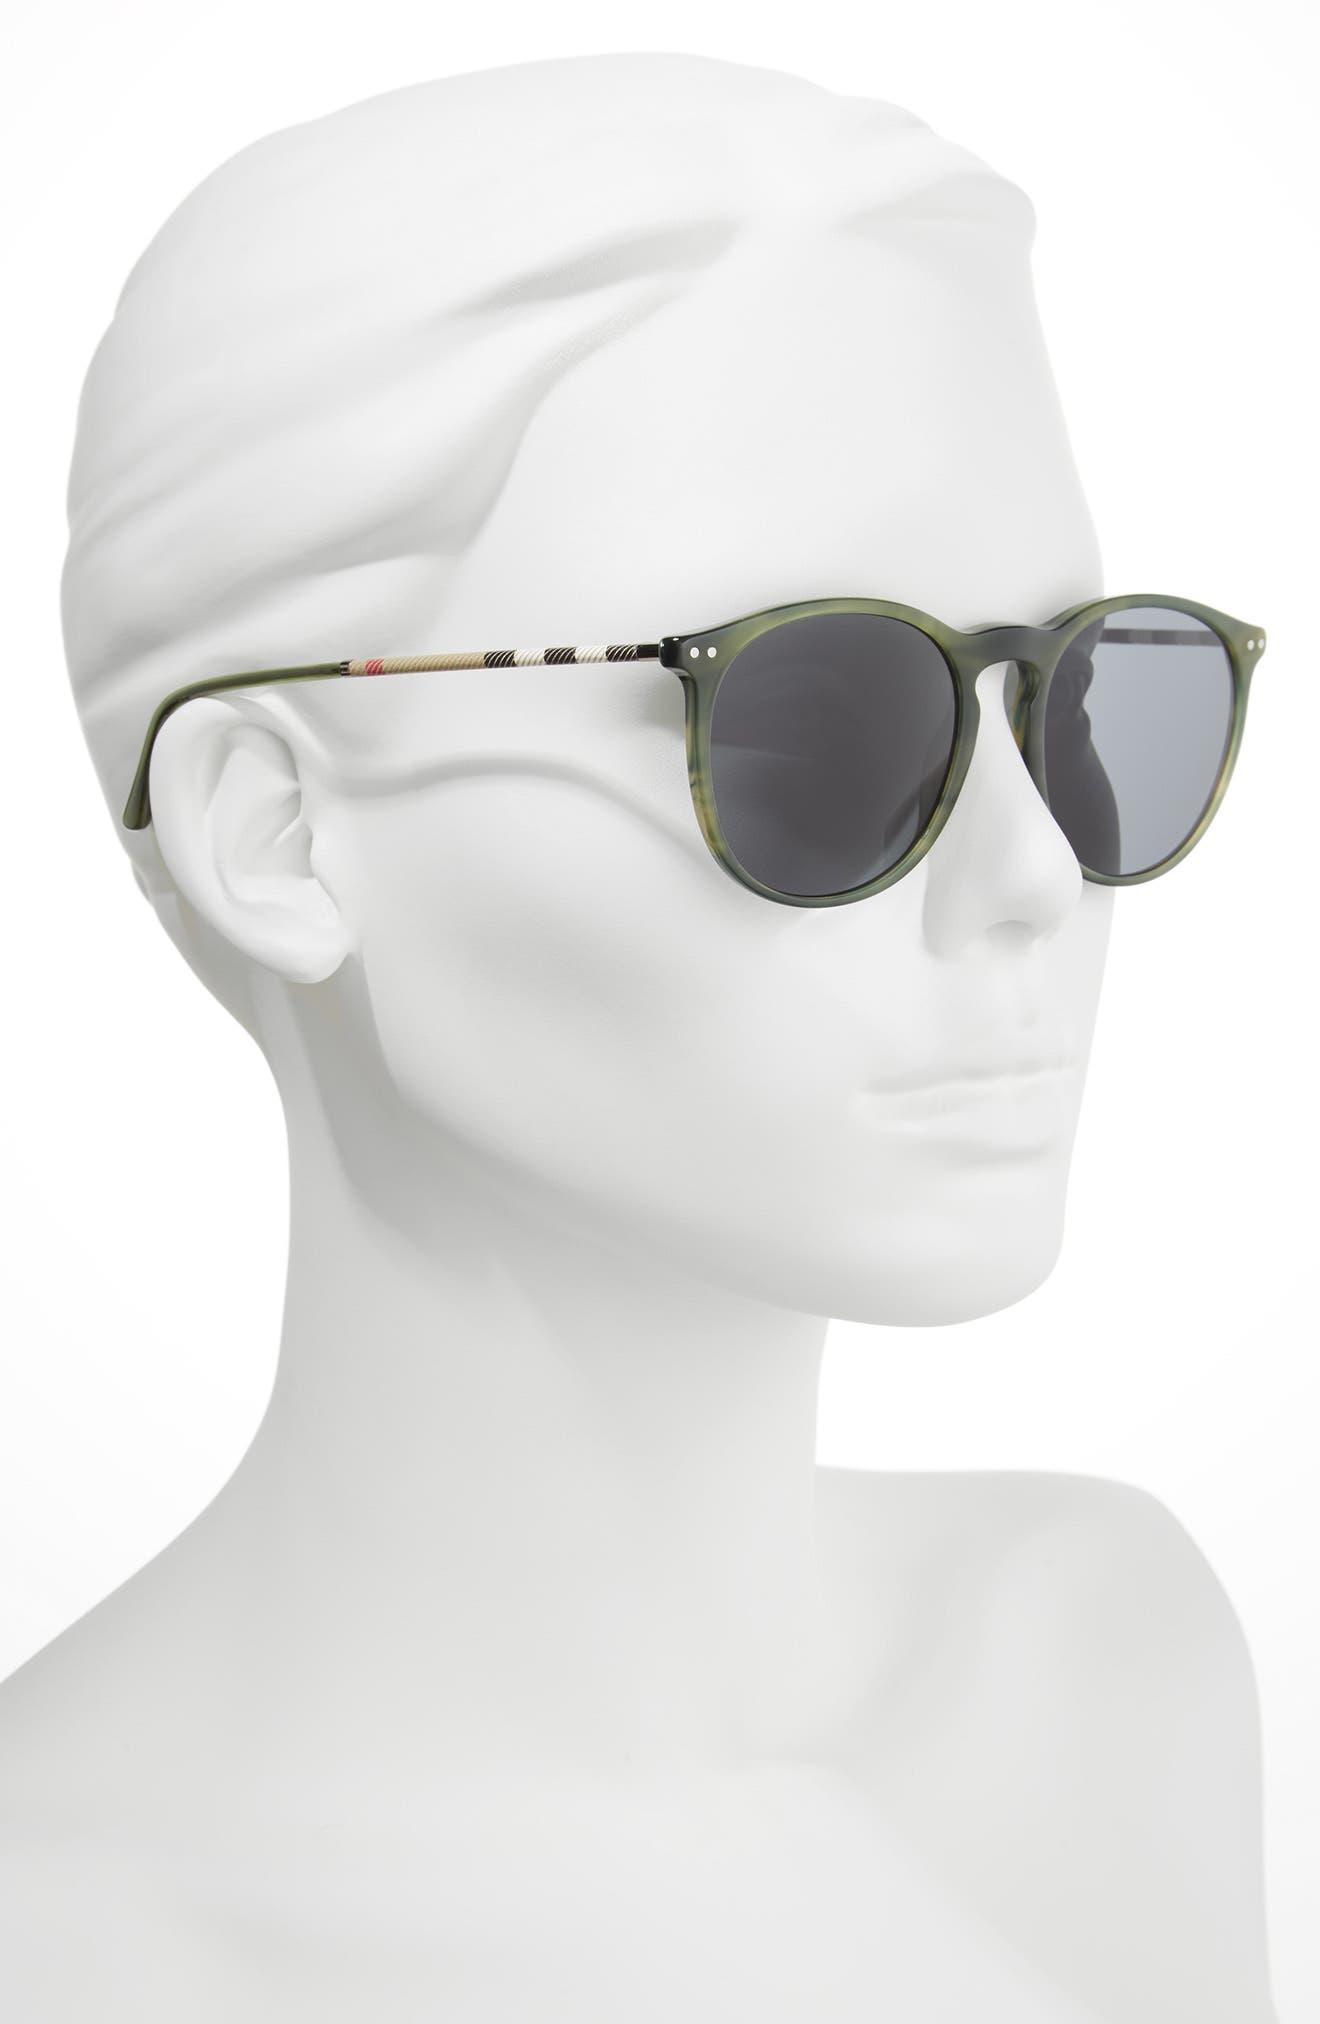 54mm Sunglasses,                             Alternate thumbnail 2, color,                             Grey/ Green